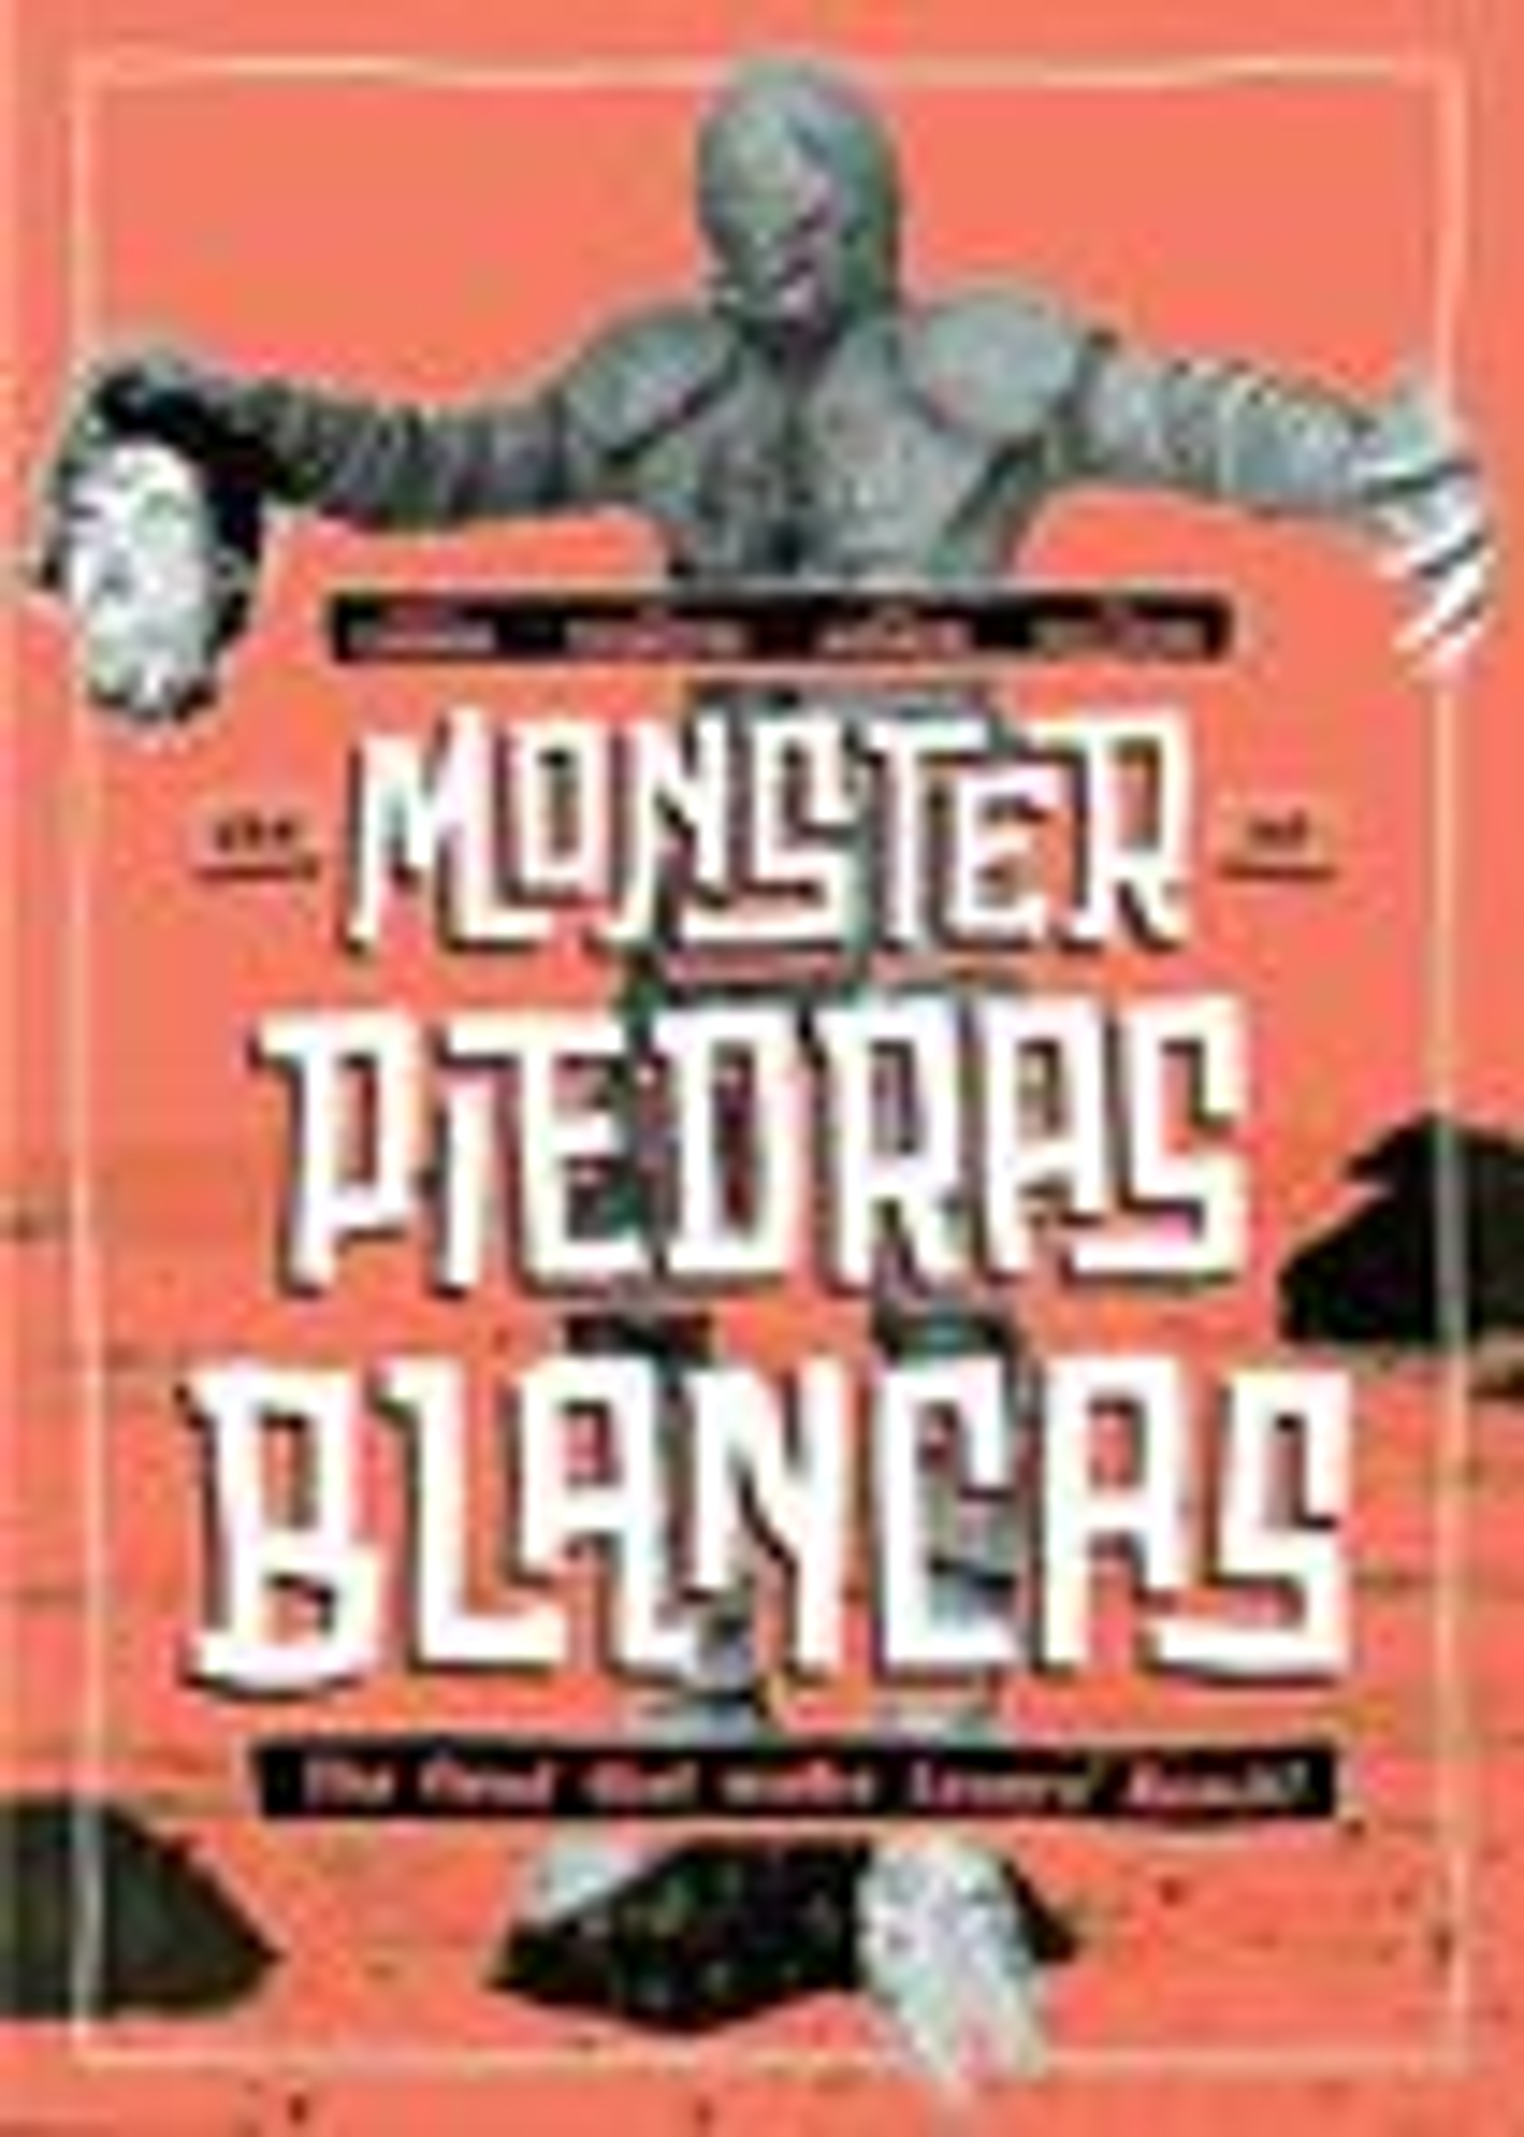 The Monster Of Piedras Blancas (dvd) 31823434